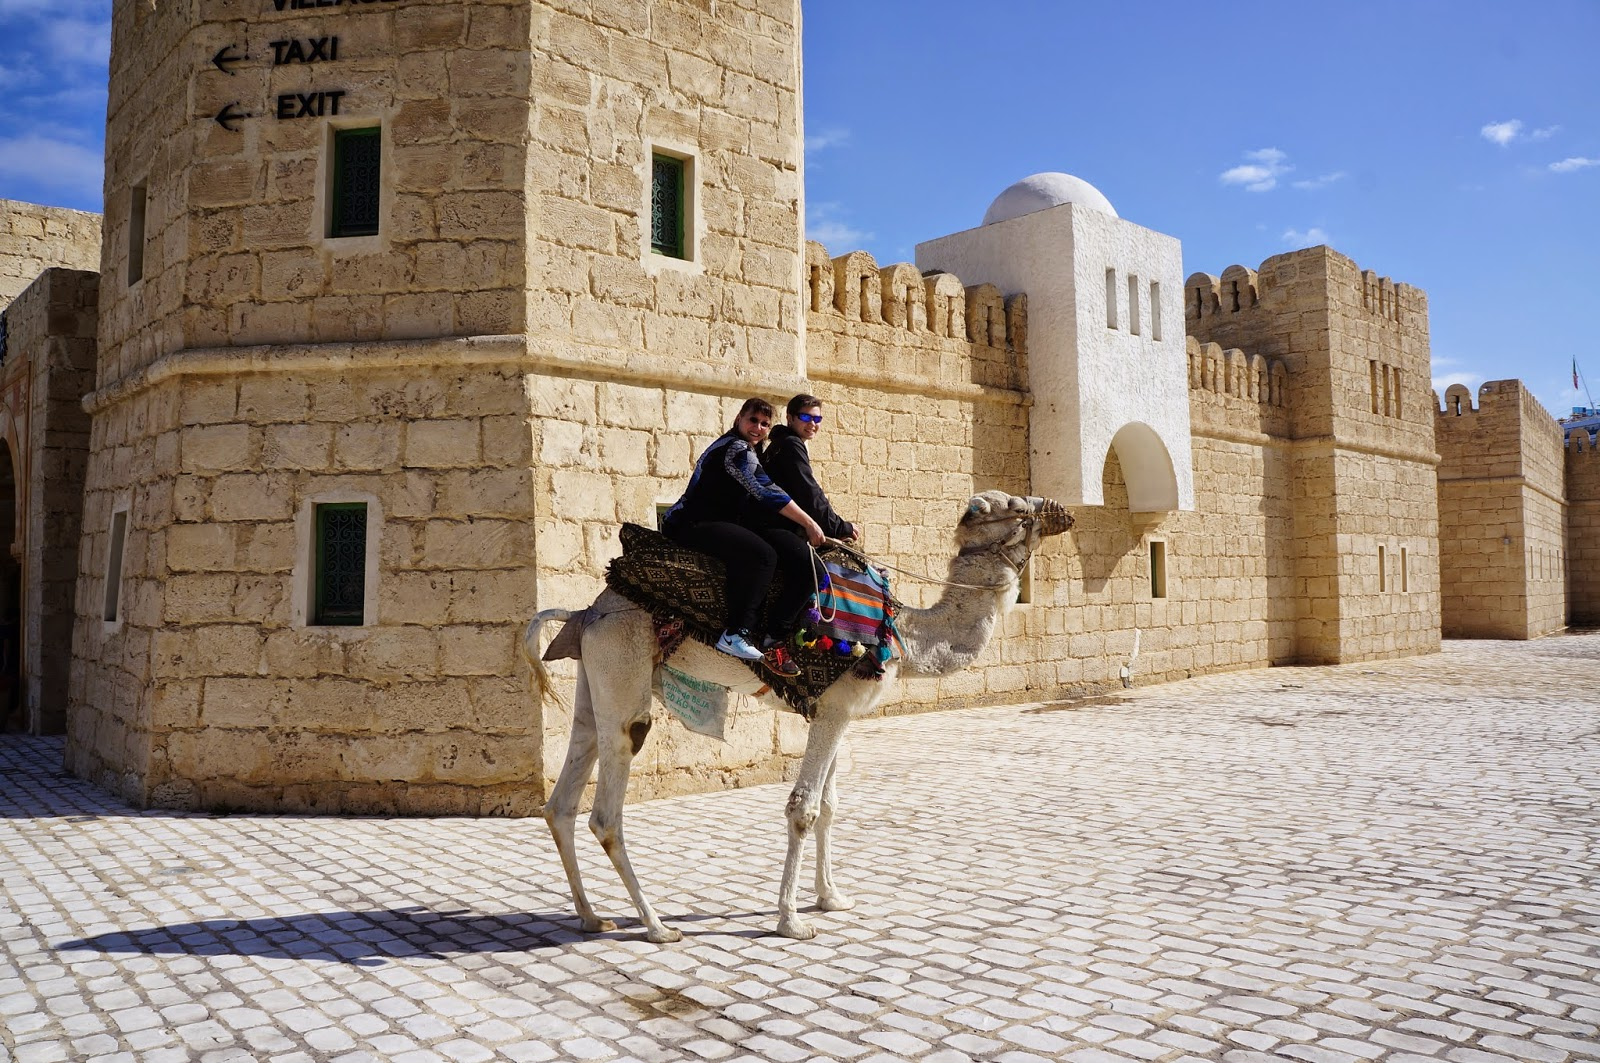 Riding a camel in Tunis Tunisia